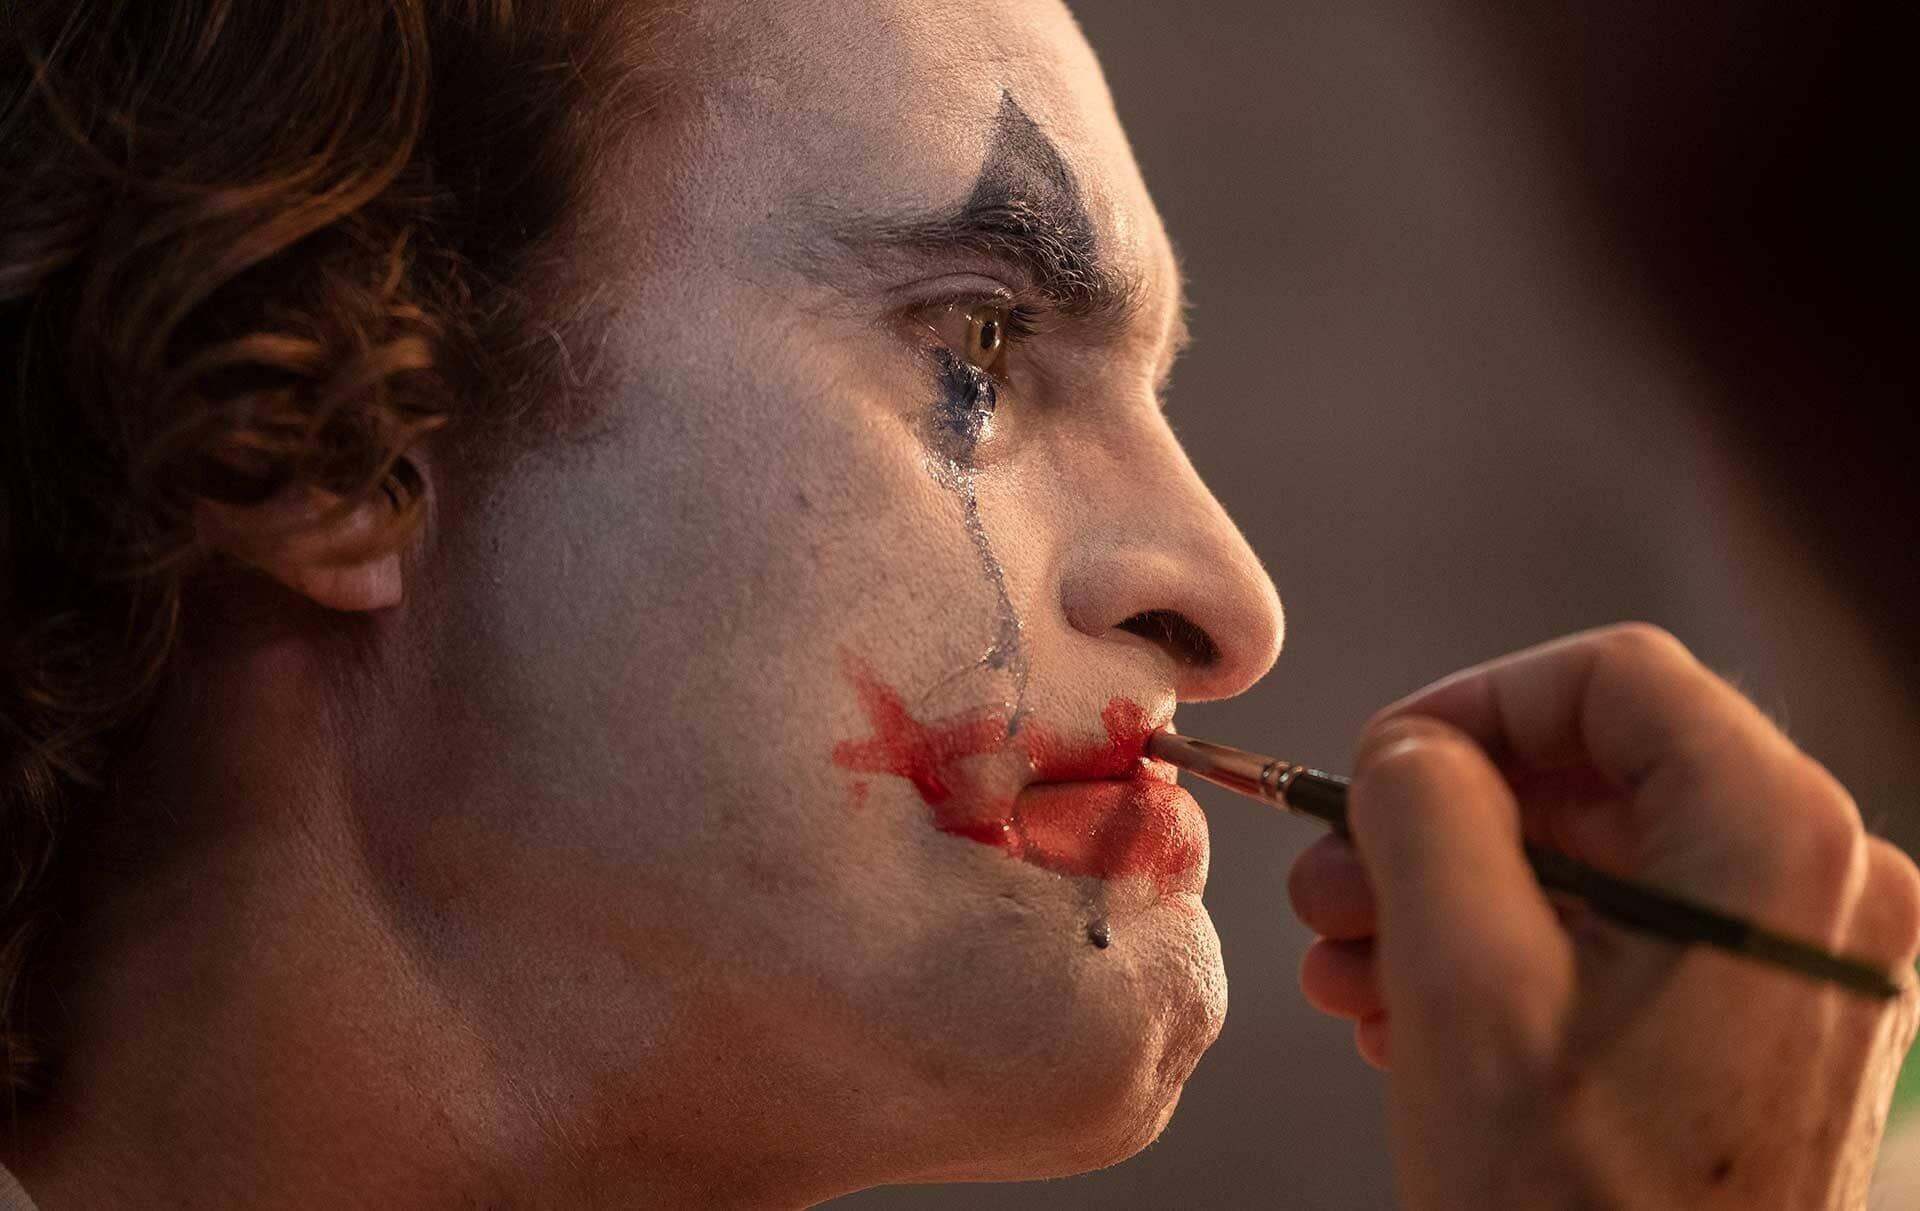 Joaquin Phoenix as Joker | image by  Niko Tavernise , c/o Warner Bros. Entertainment